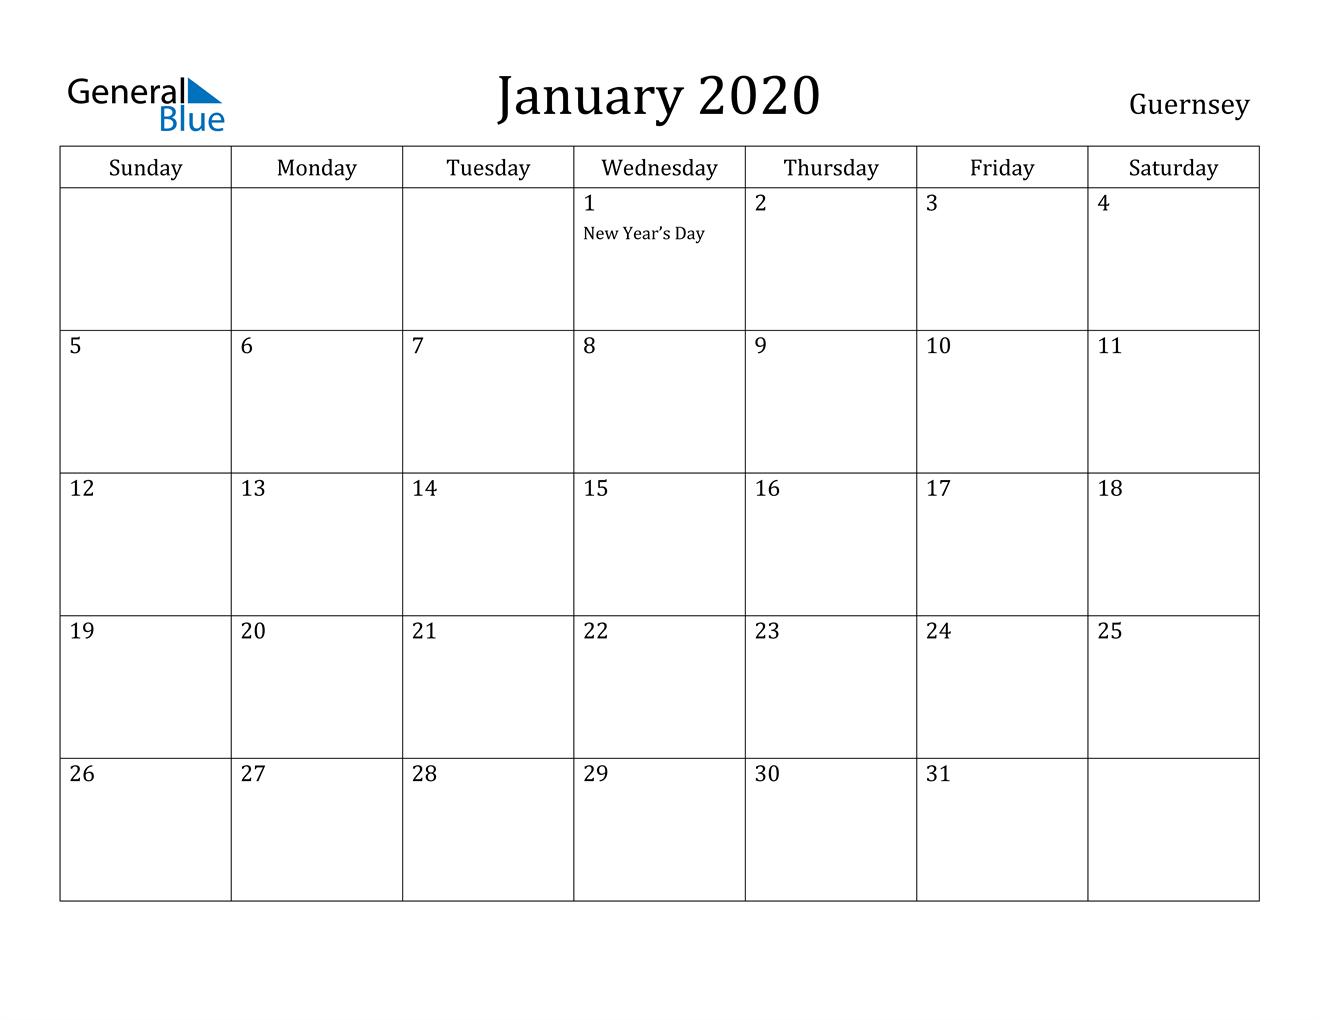 Image of January 2020 Guernsey Calendar with Holidays Calendar